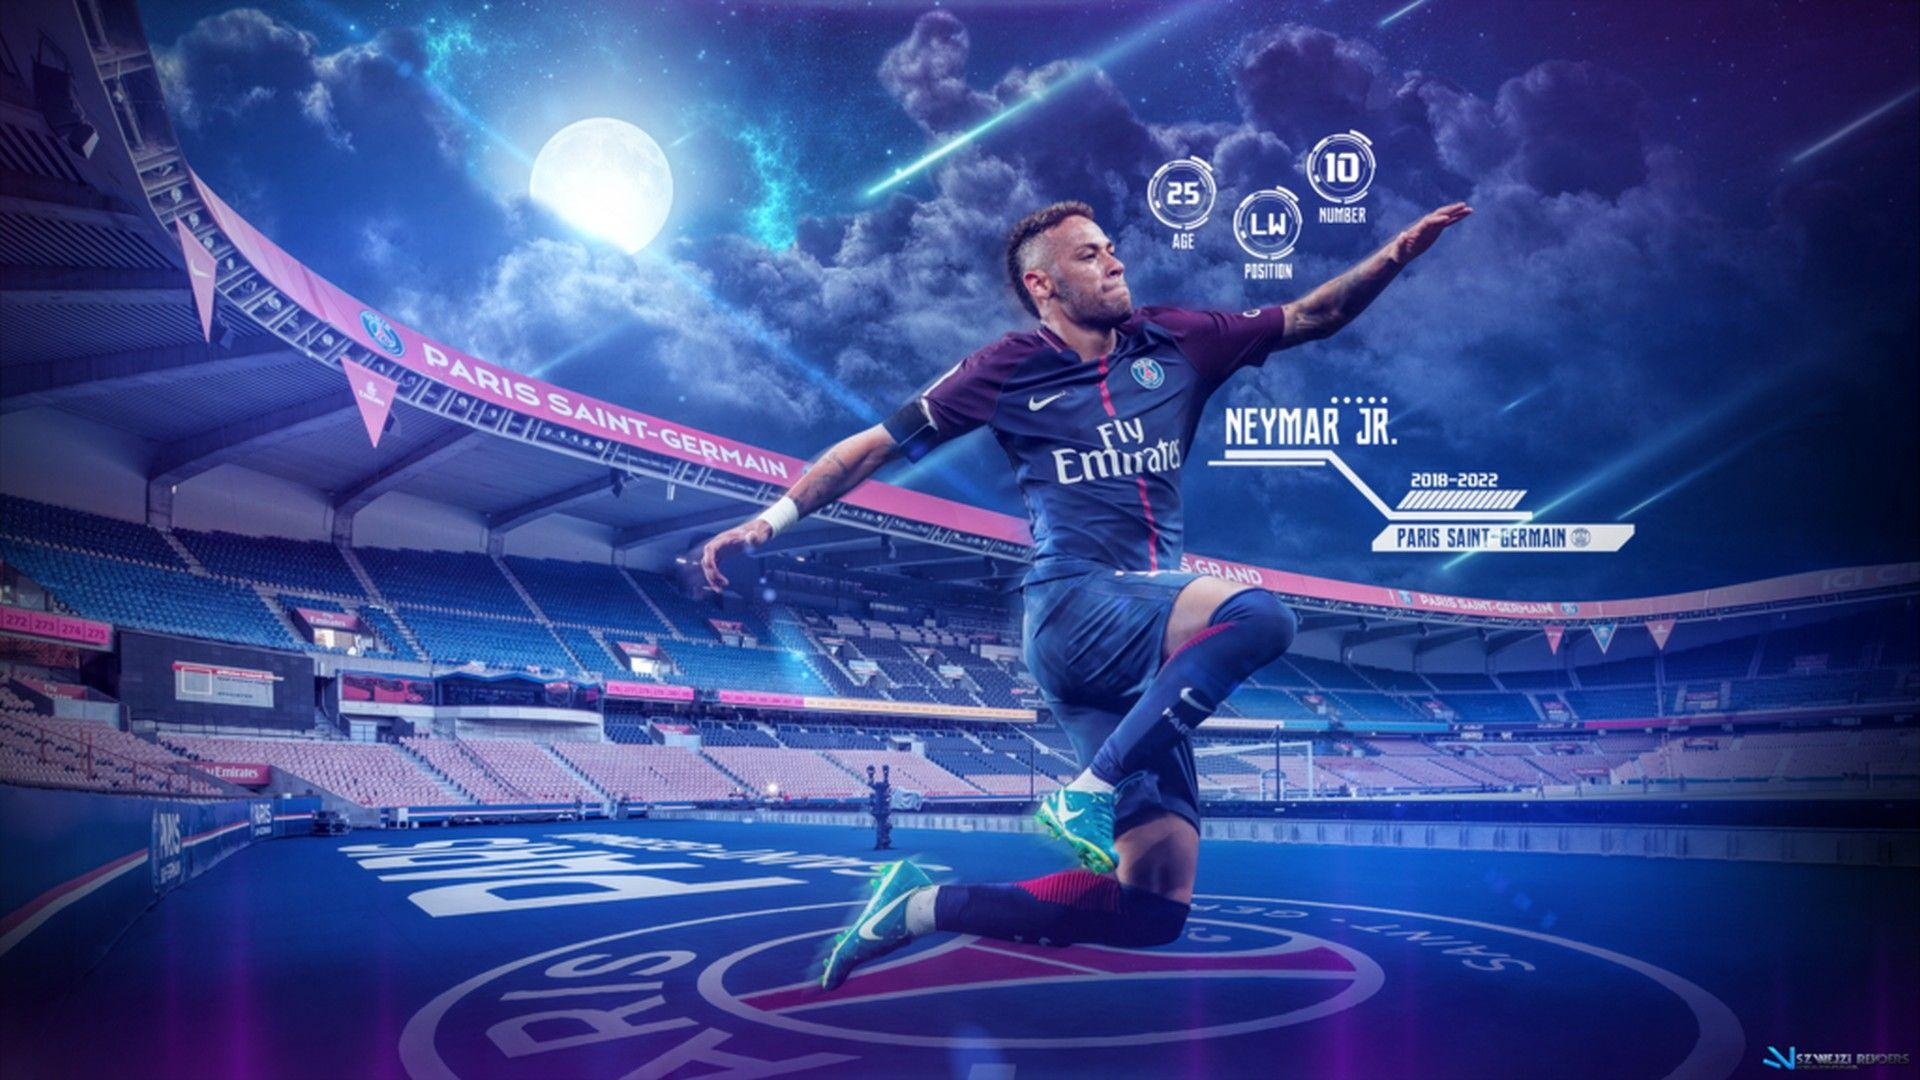 Neymar PSG HD Wallpaper 2018